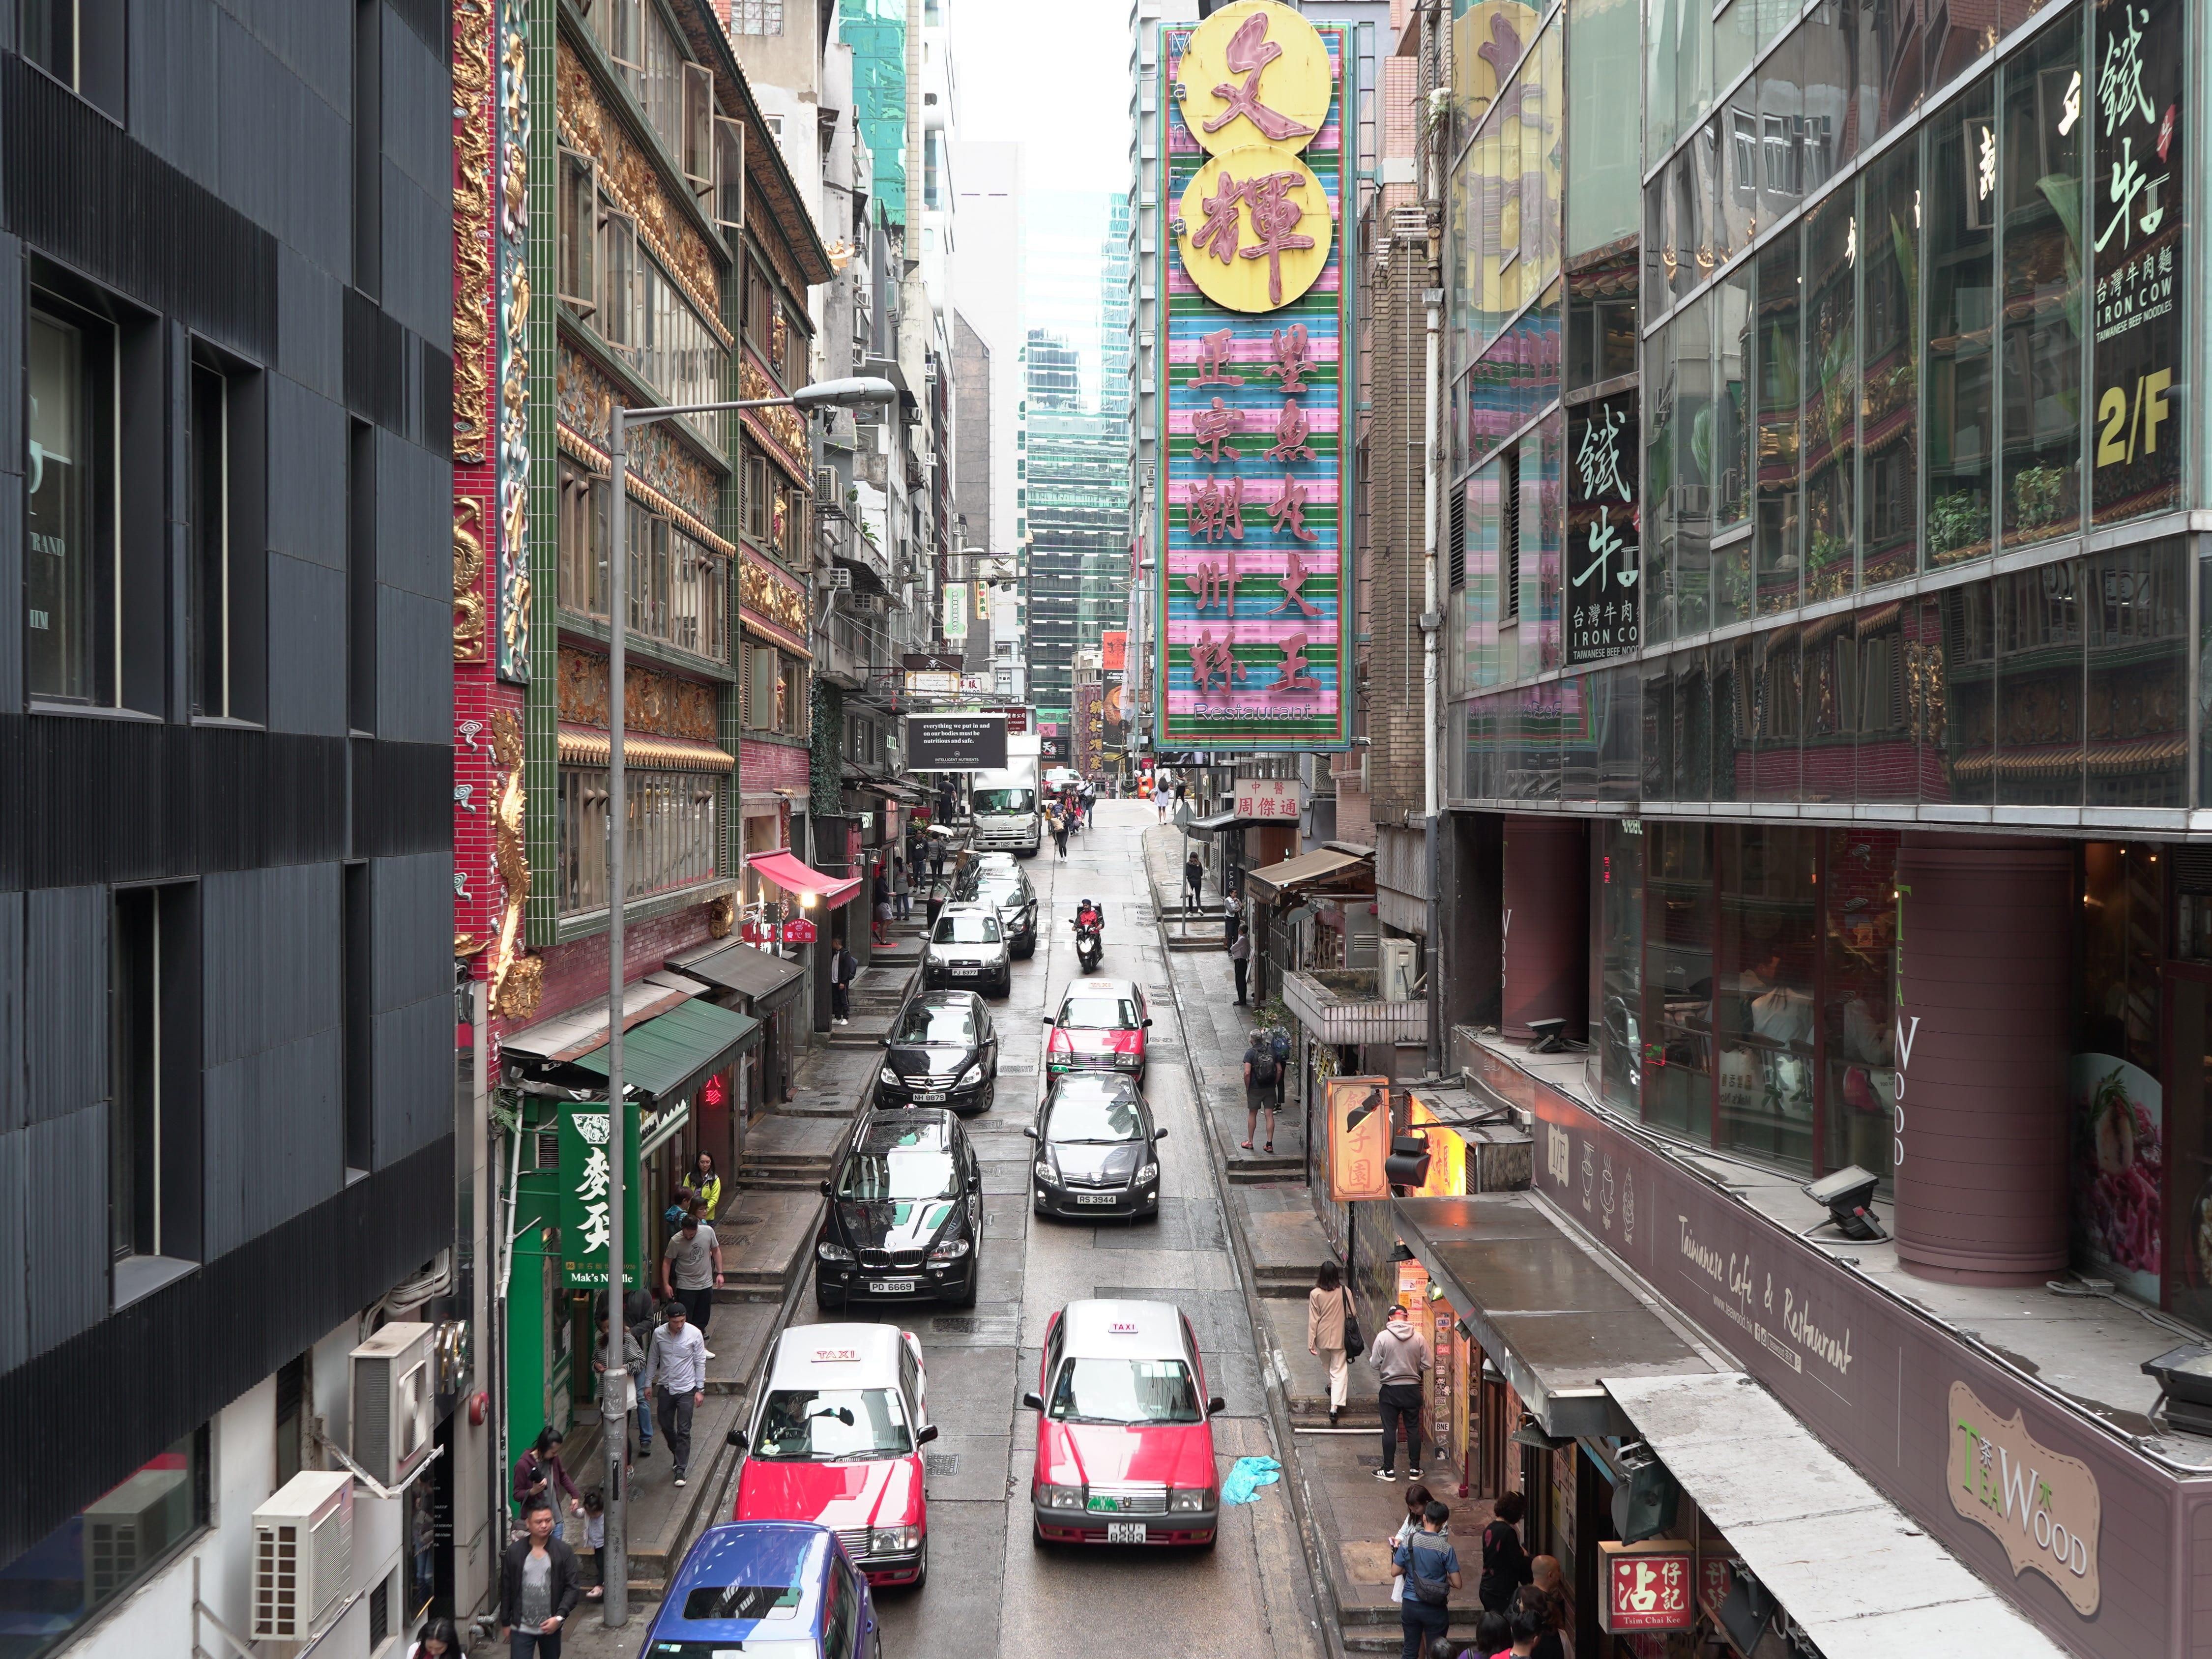 The colorful streets of Hong Kong.